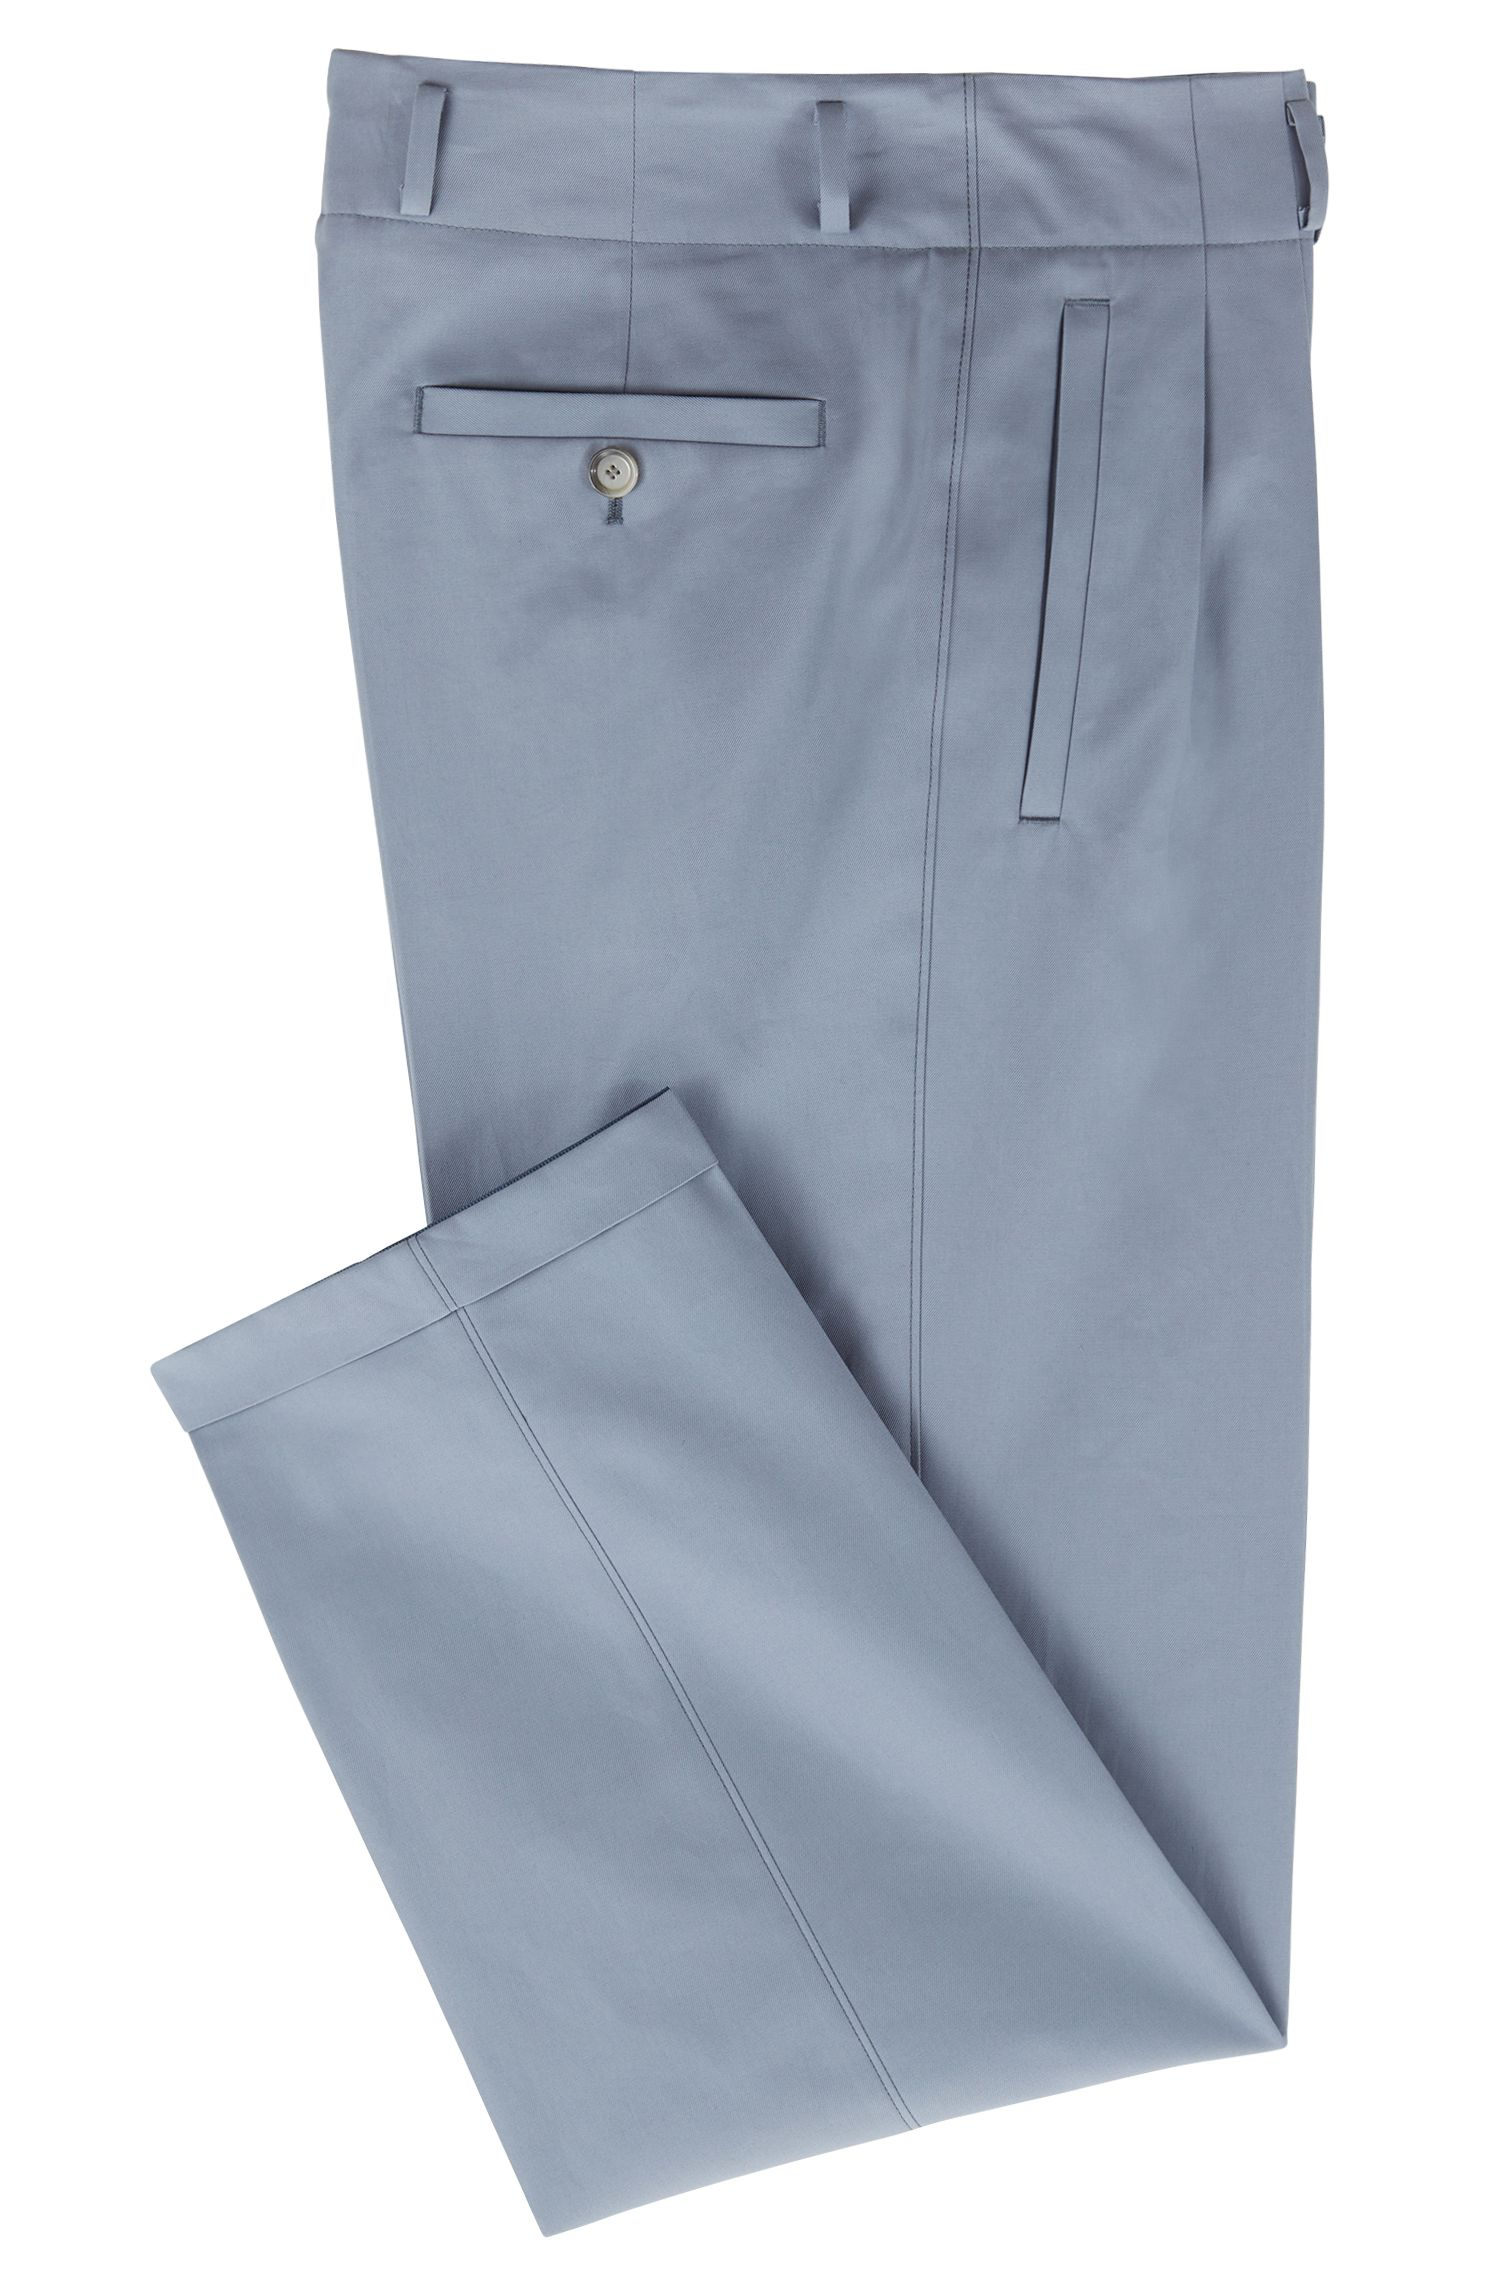 Pantalones relaxed fit de talle alto con pinzas en algodón italiano